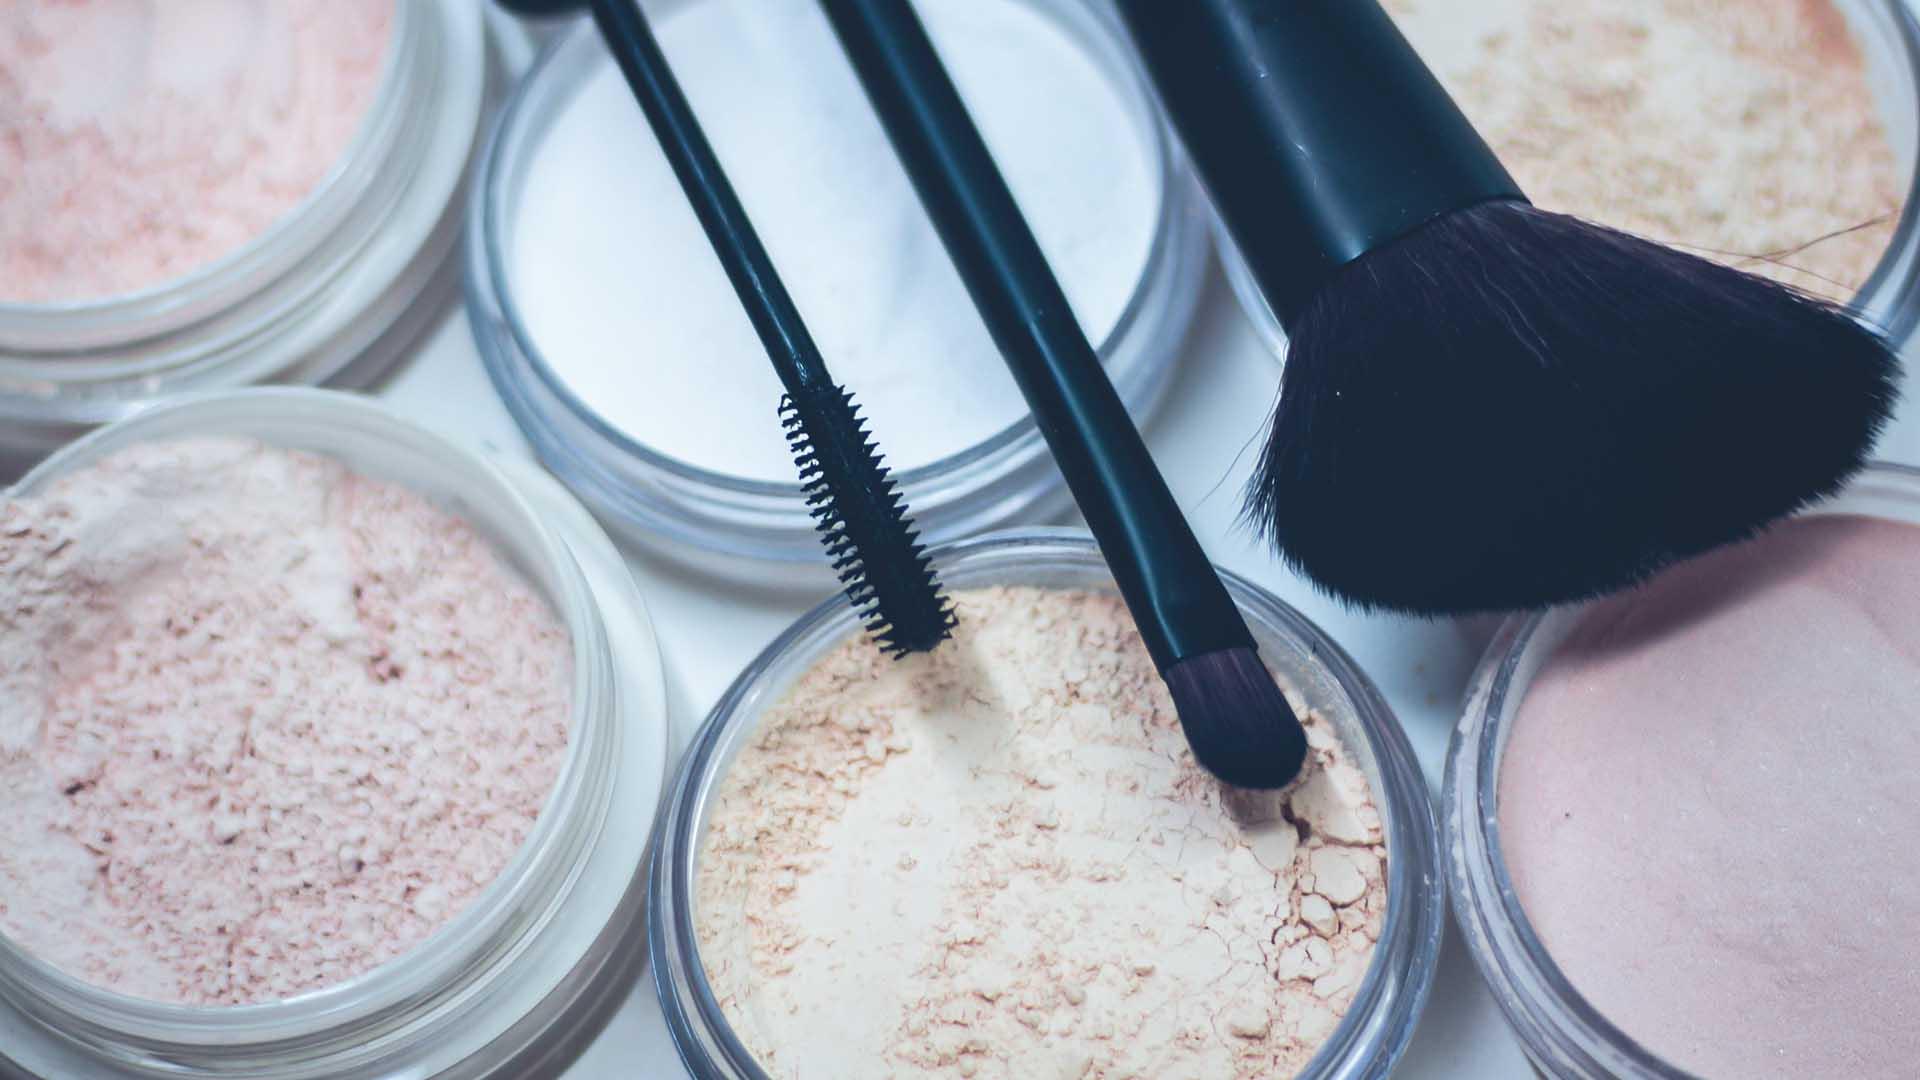 cosmetici inquinanti